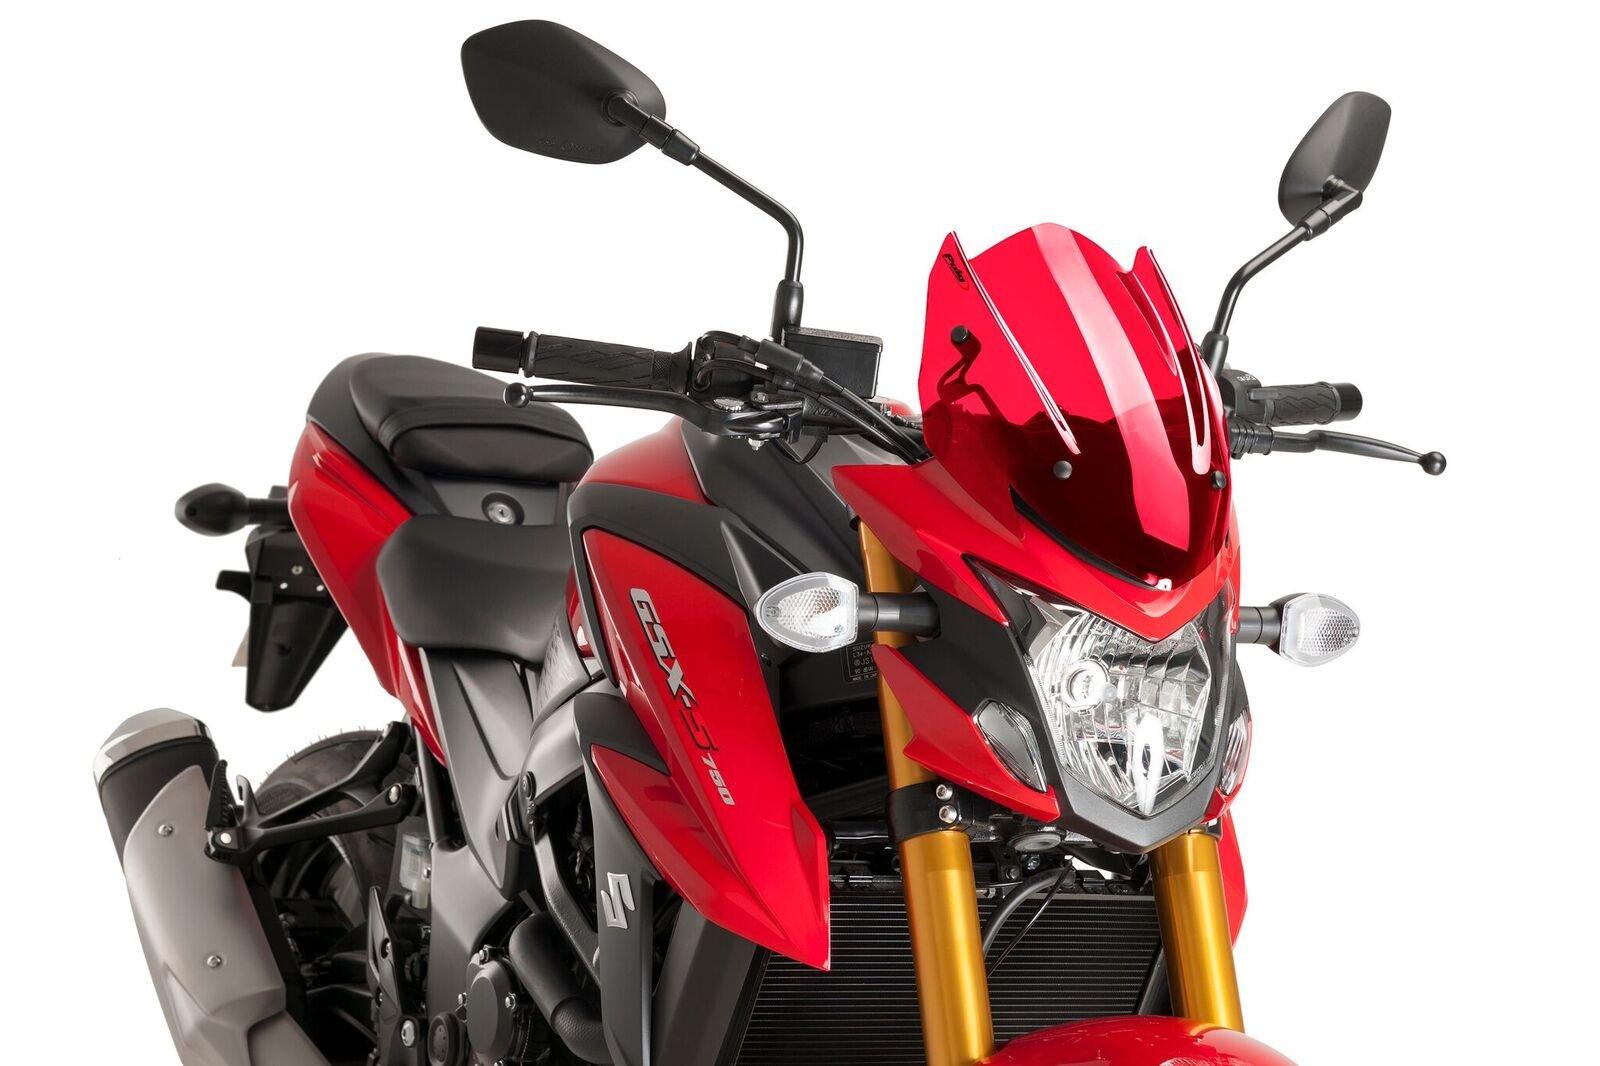 Puig Windshield 9435R Naked New Generation Sport Screen 2017 Suzuki GSX-S750 Red Windscreen